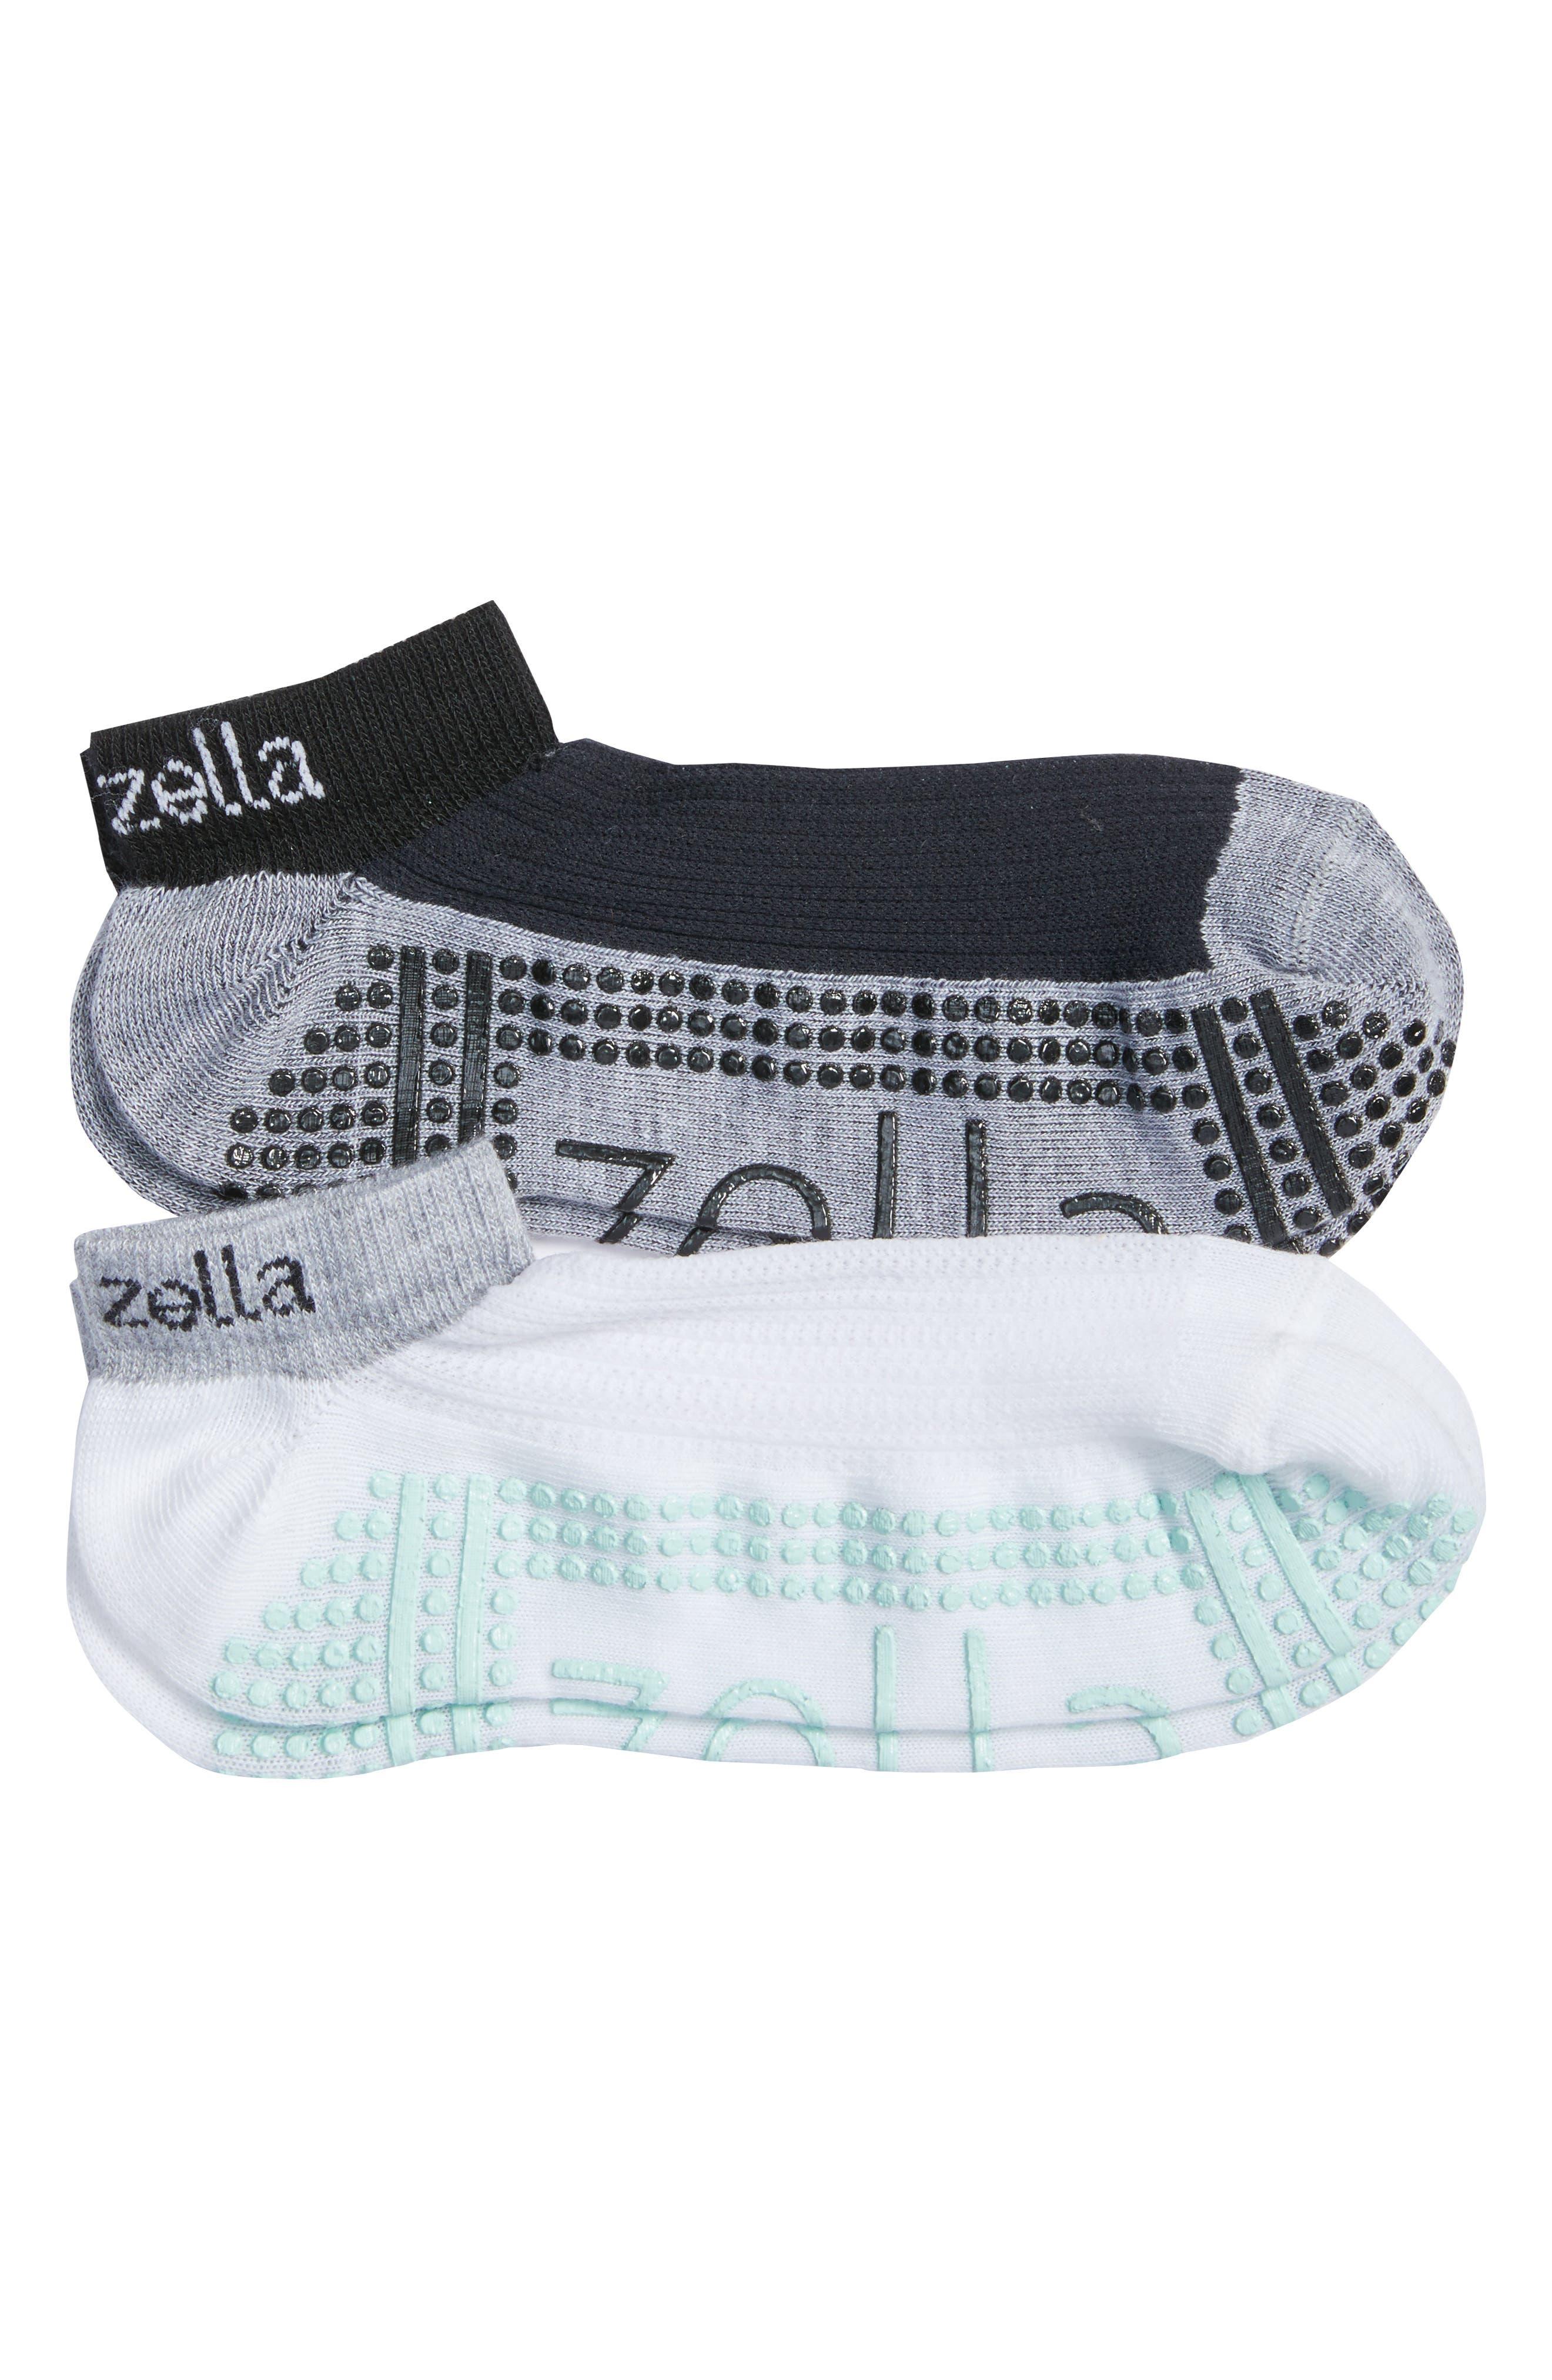 2-Pack Studio Ankle Socks,                             Main thumbnail 1, color,                             025